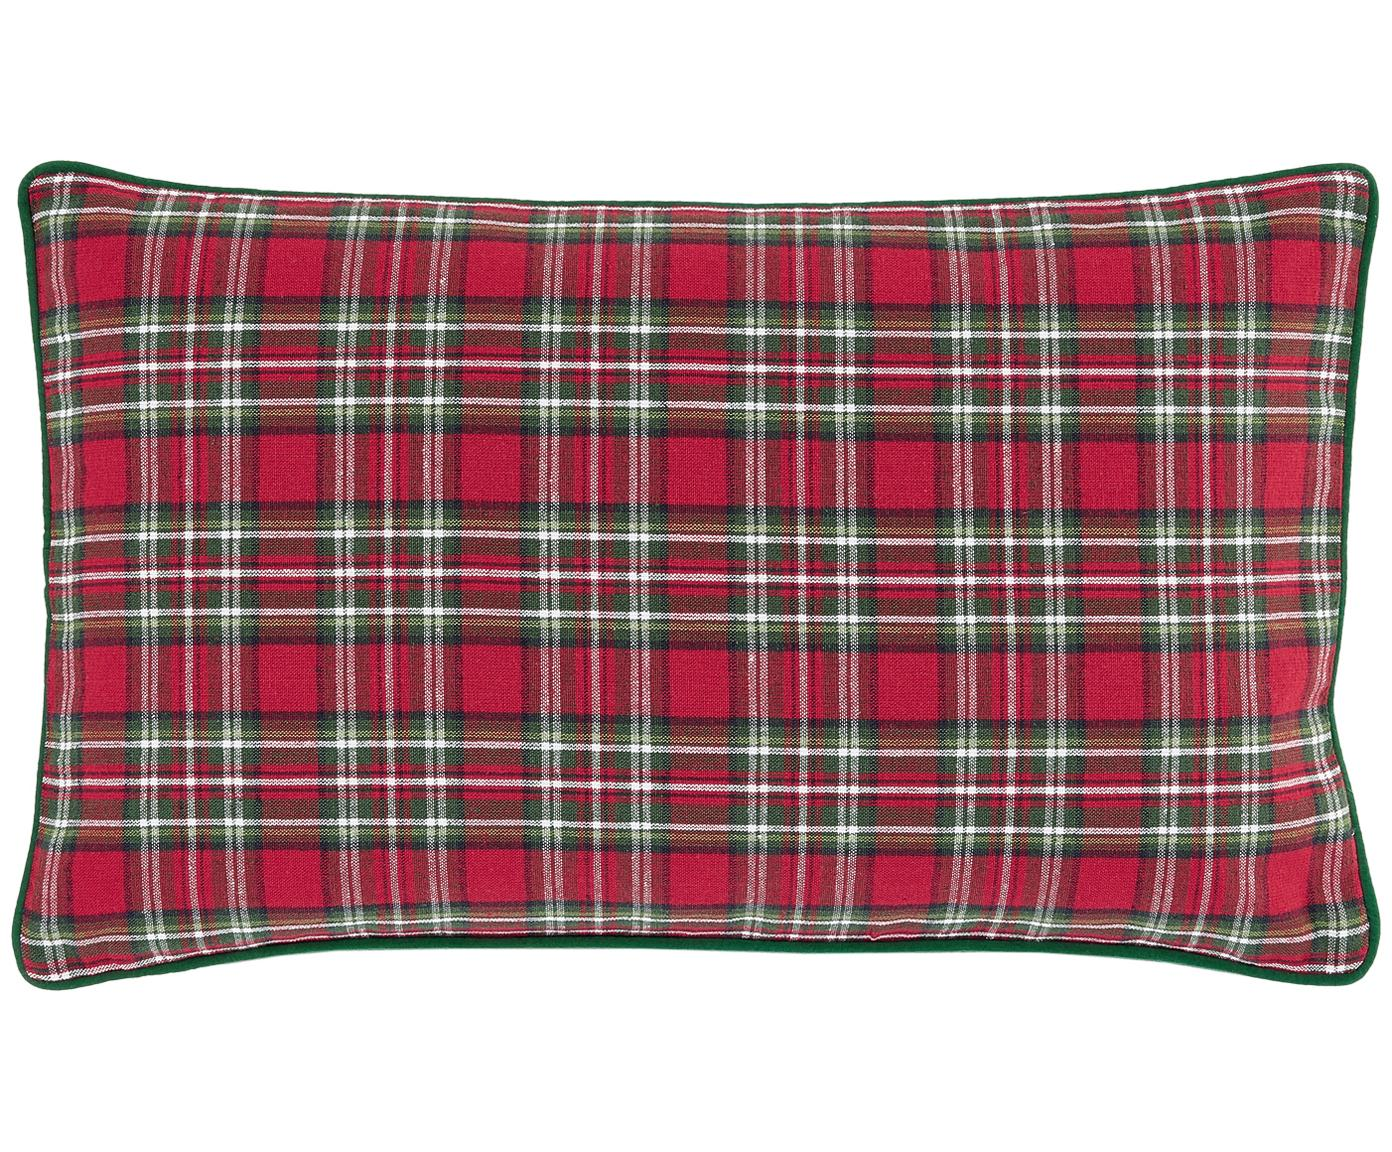 Funda de cojín Tartan, 100%algodón, Rojo, verde oscuro, An 30 x L 50 cm